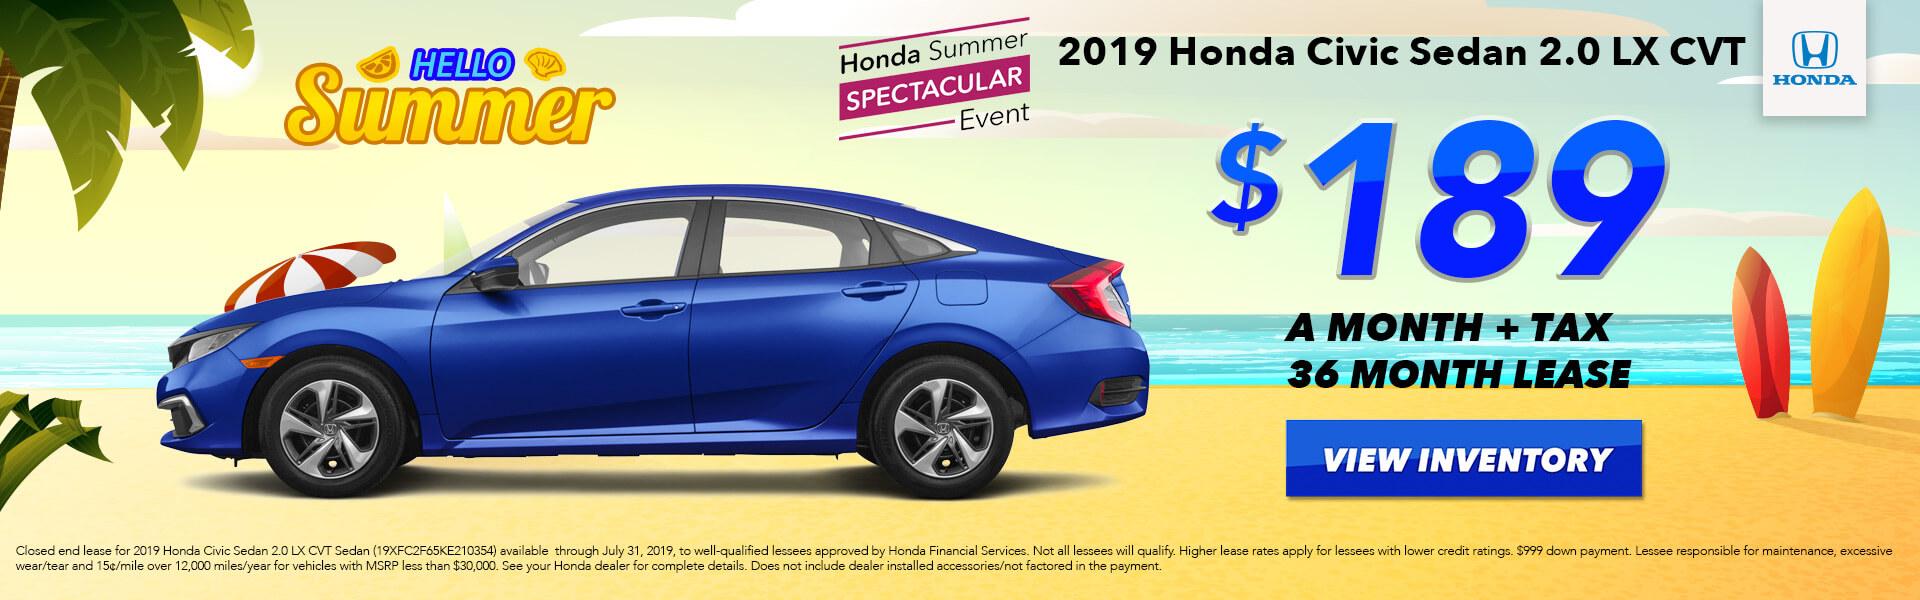 2019 Honda Civic Lease for $189